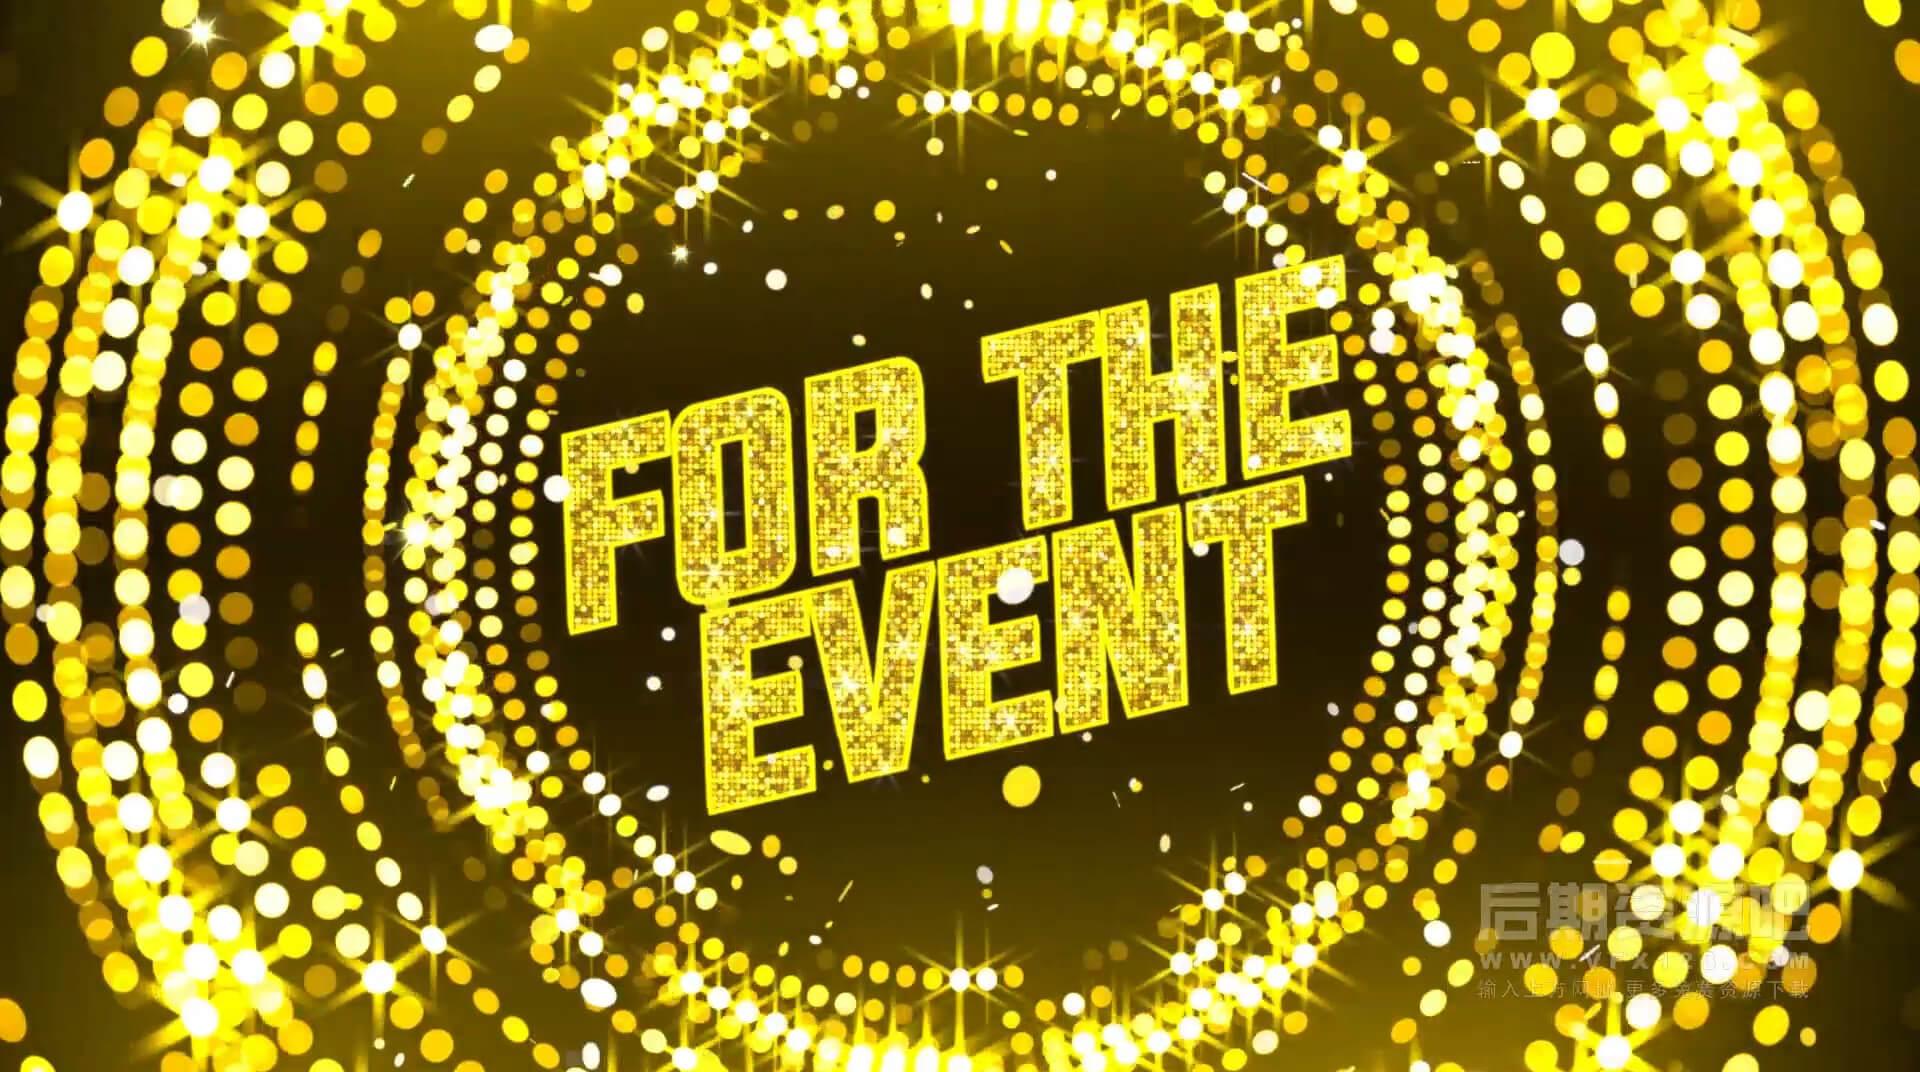 fcpx主题模板 聚会颁奖派对促销开幕式节日粒子闪光开场片头 Party Invitation Opener